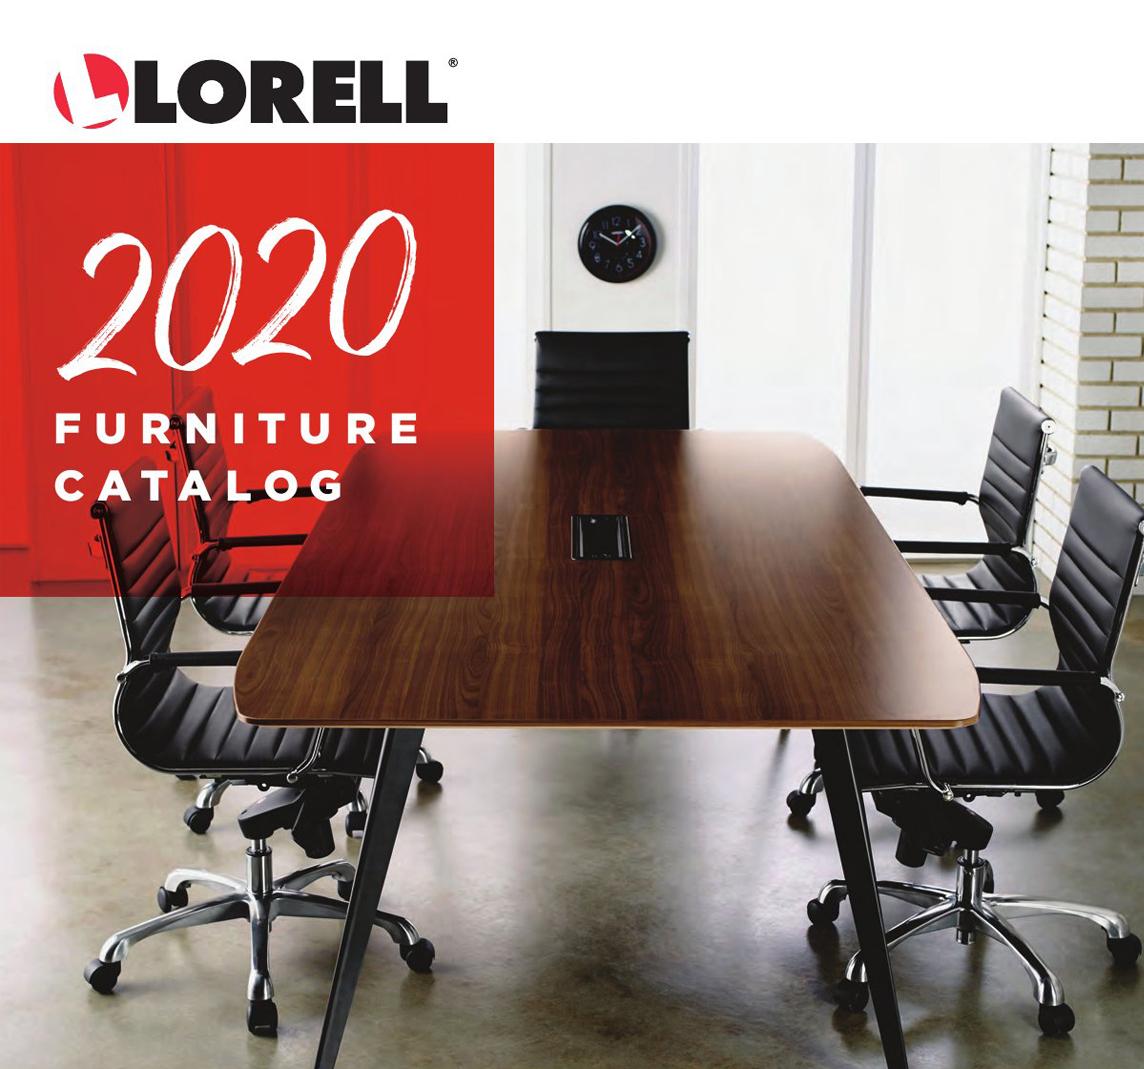 2020 Lorell Catalog